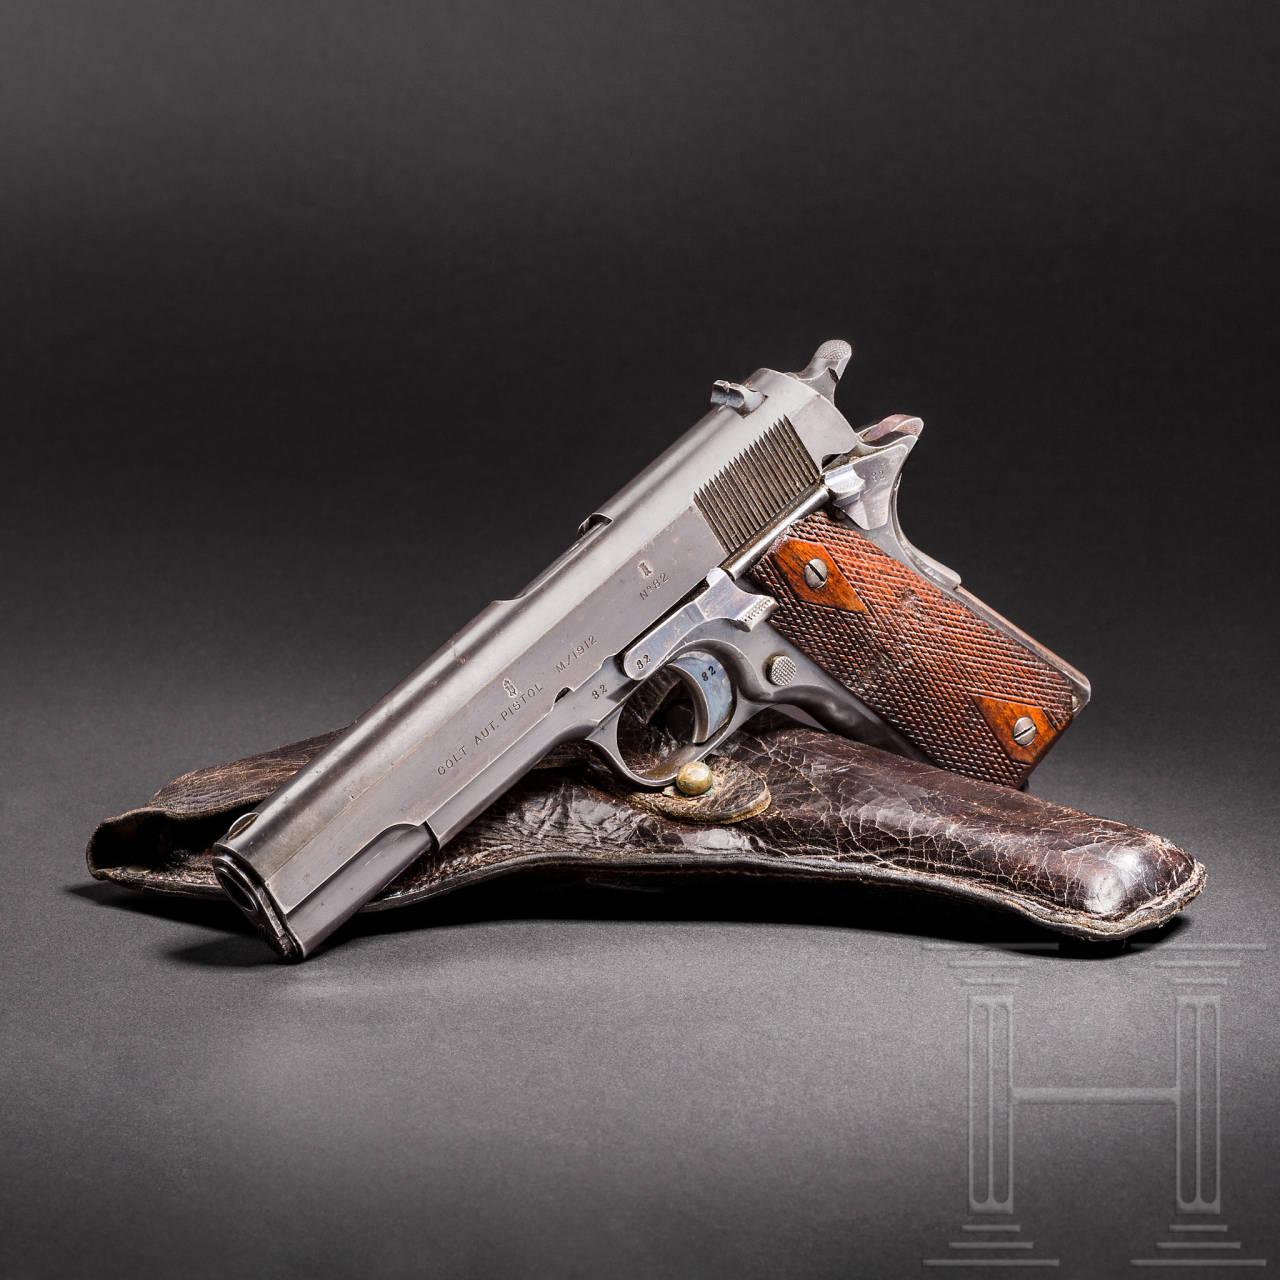 Colt Kongsberg Mod. 1912, 1. Ausführung, mit Tasche